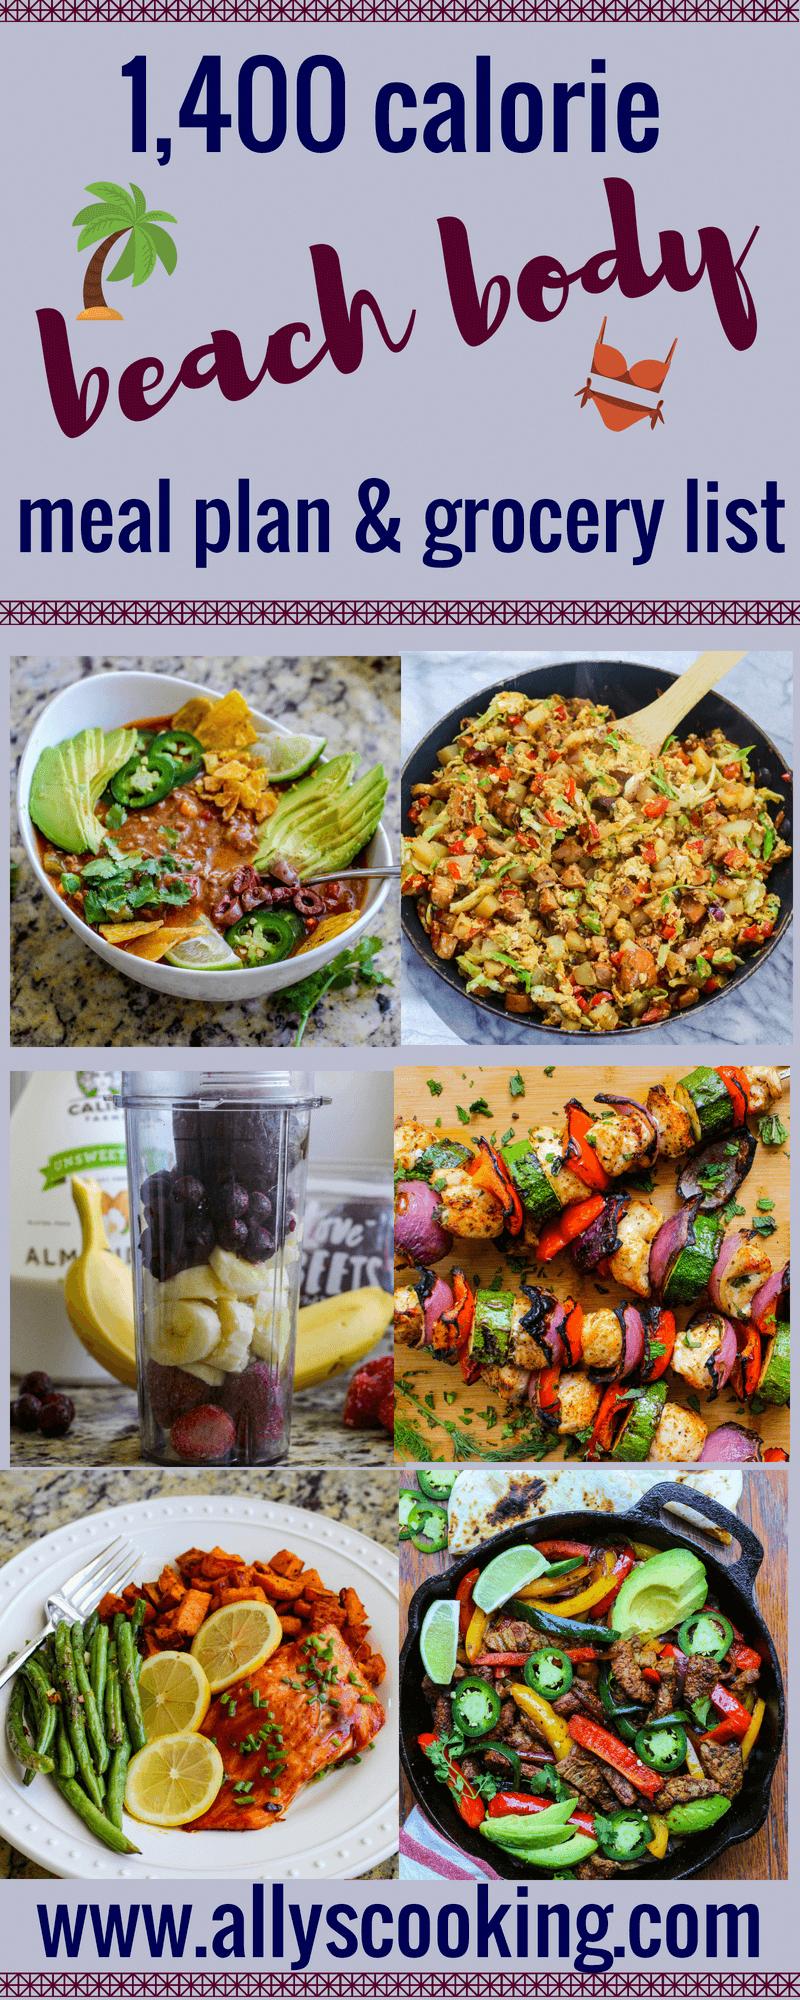 1400 Calorie Beach Body Meal Plan  Grocery List